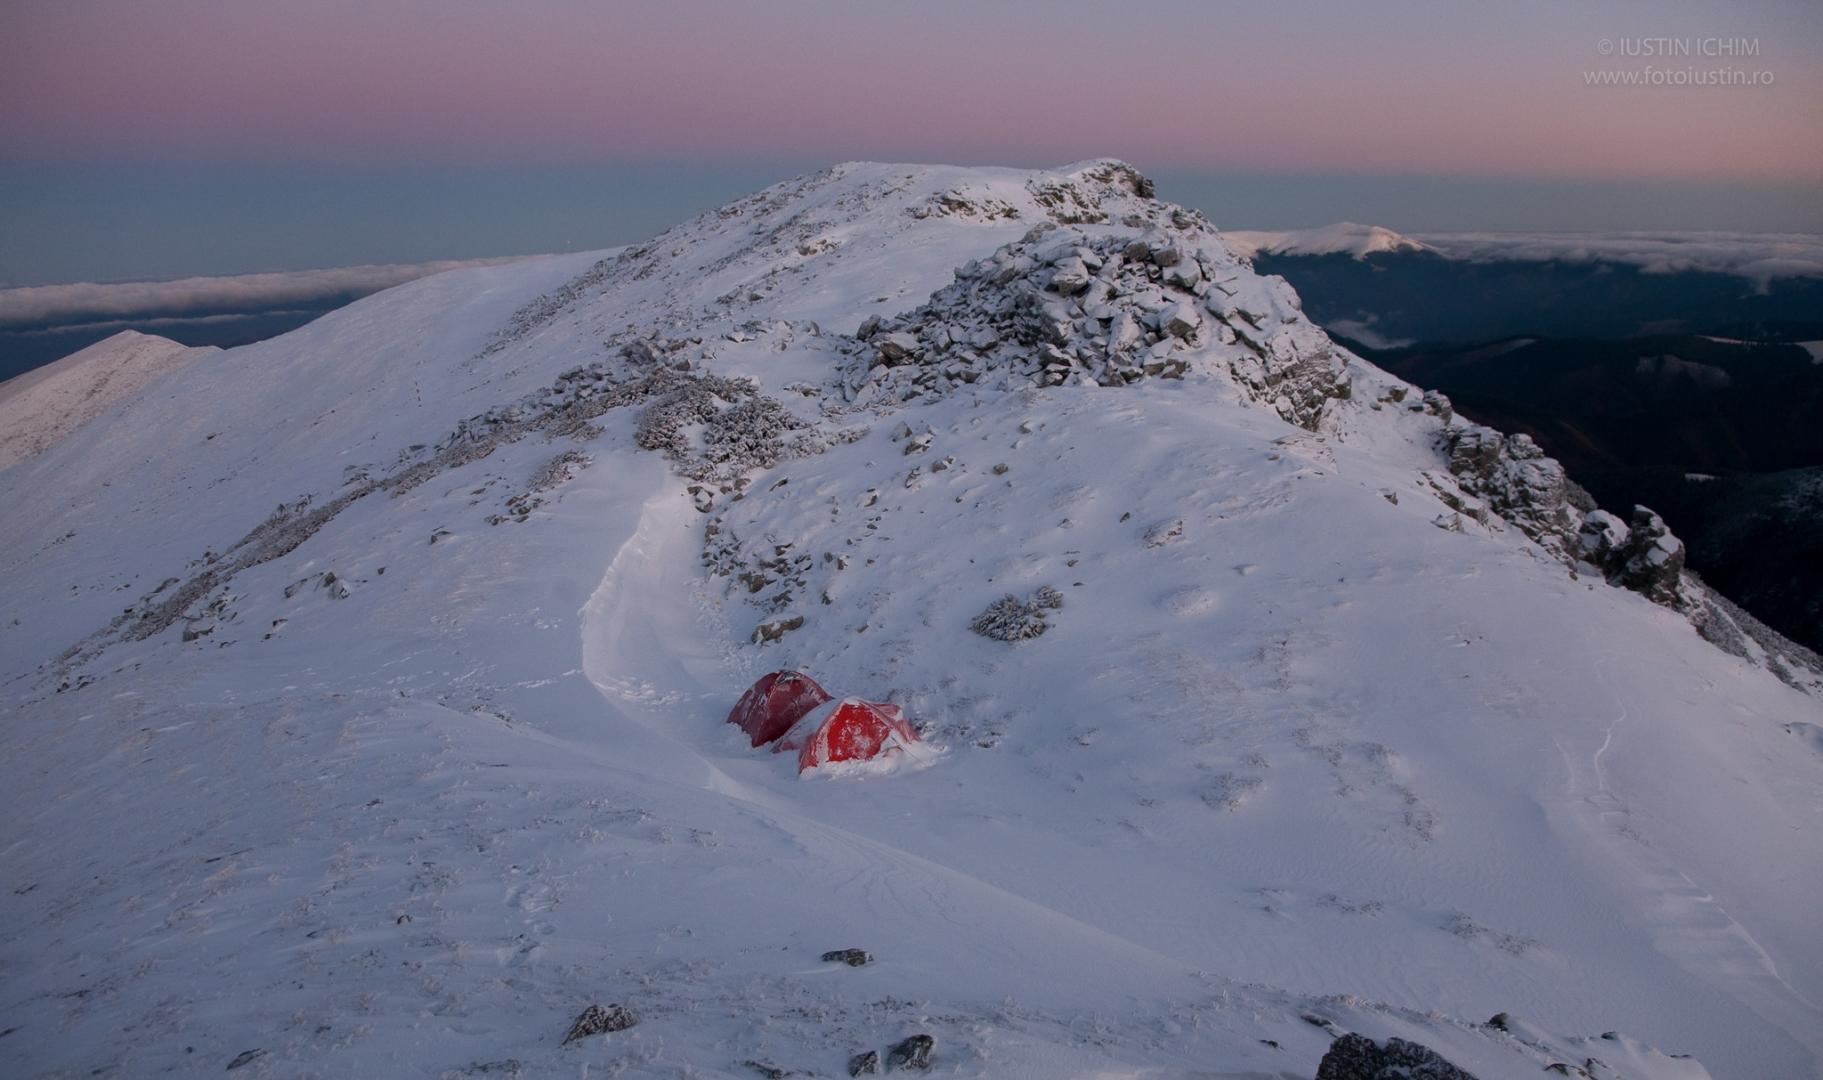 Iarna la cort in Parâng